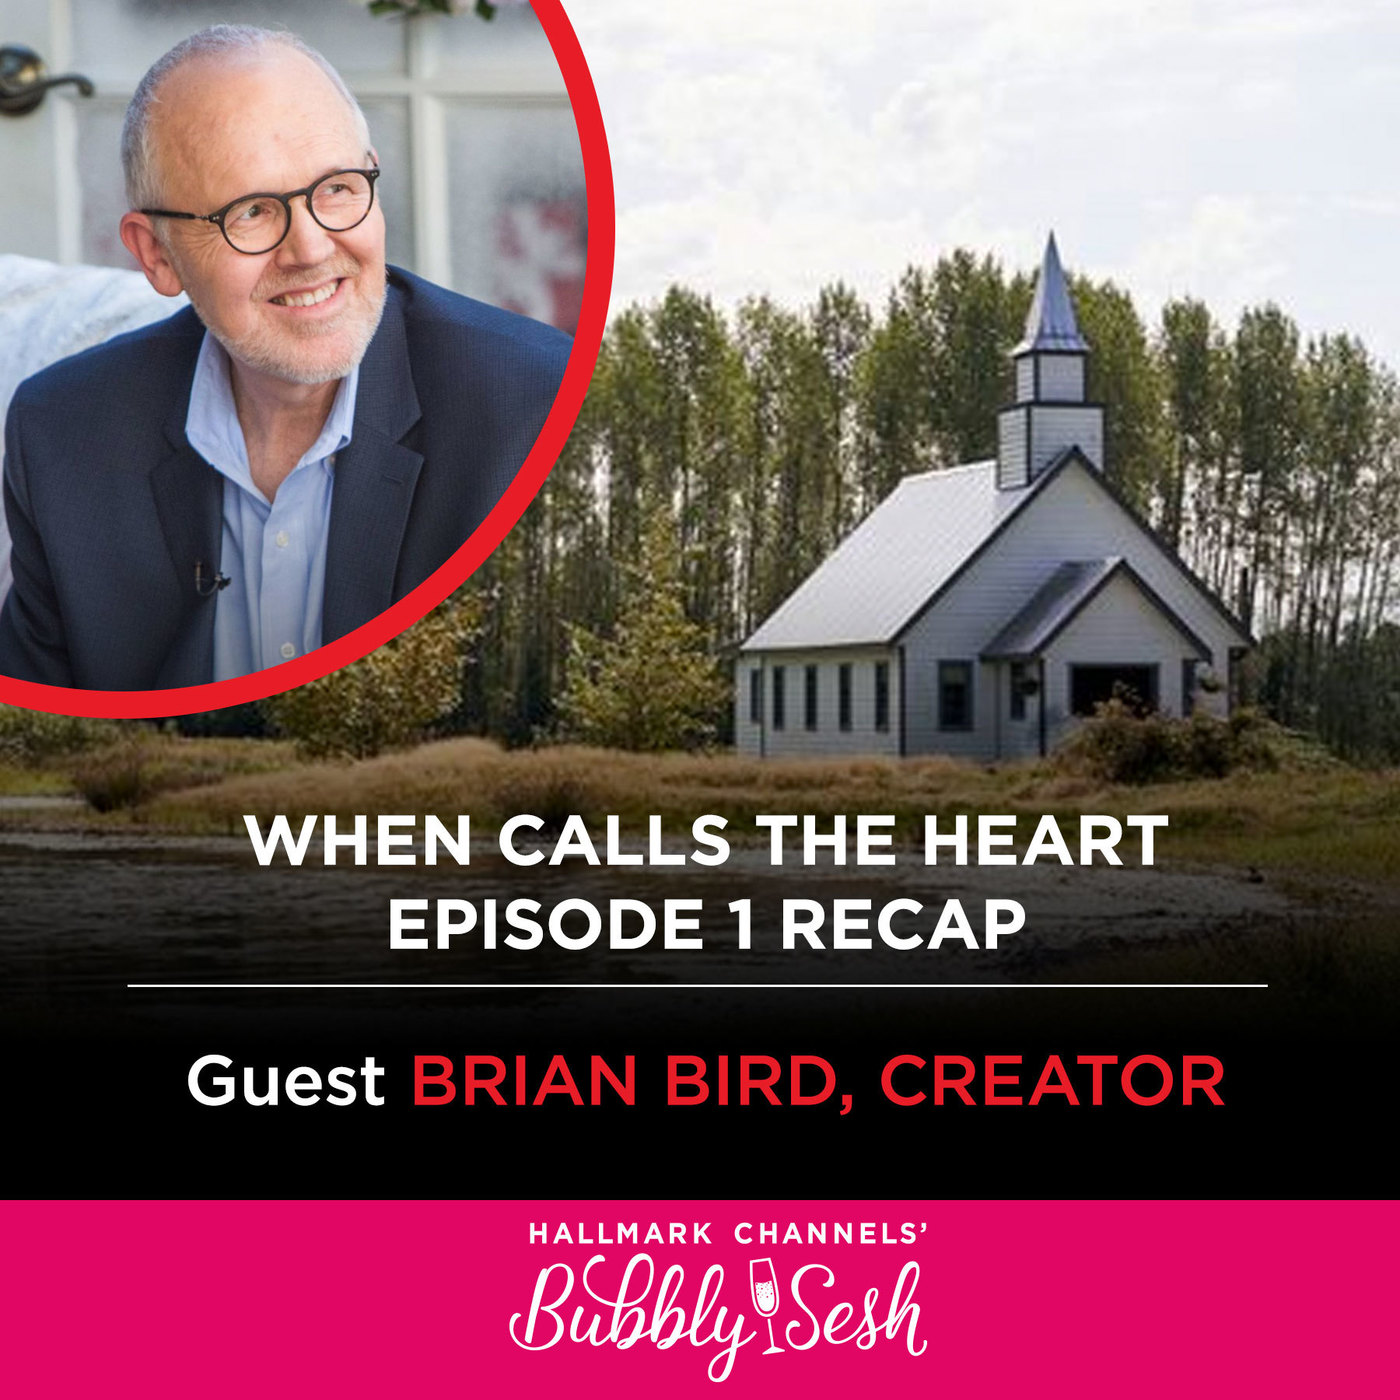 When Calls The Heart Episode 1 Recap with Guest Brian Bird, Creator